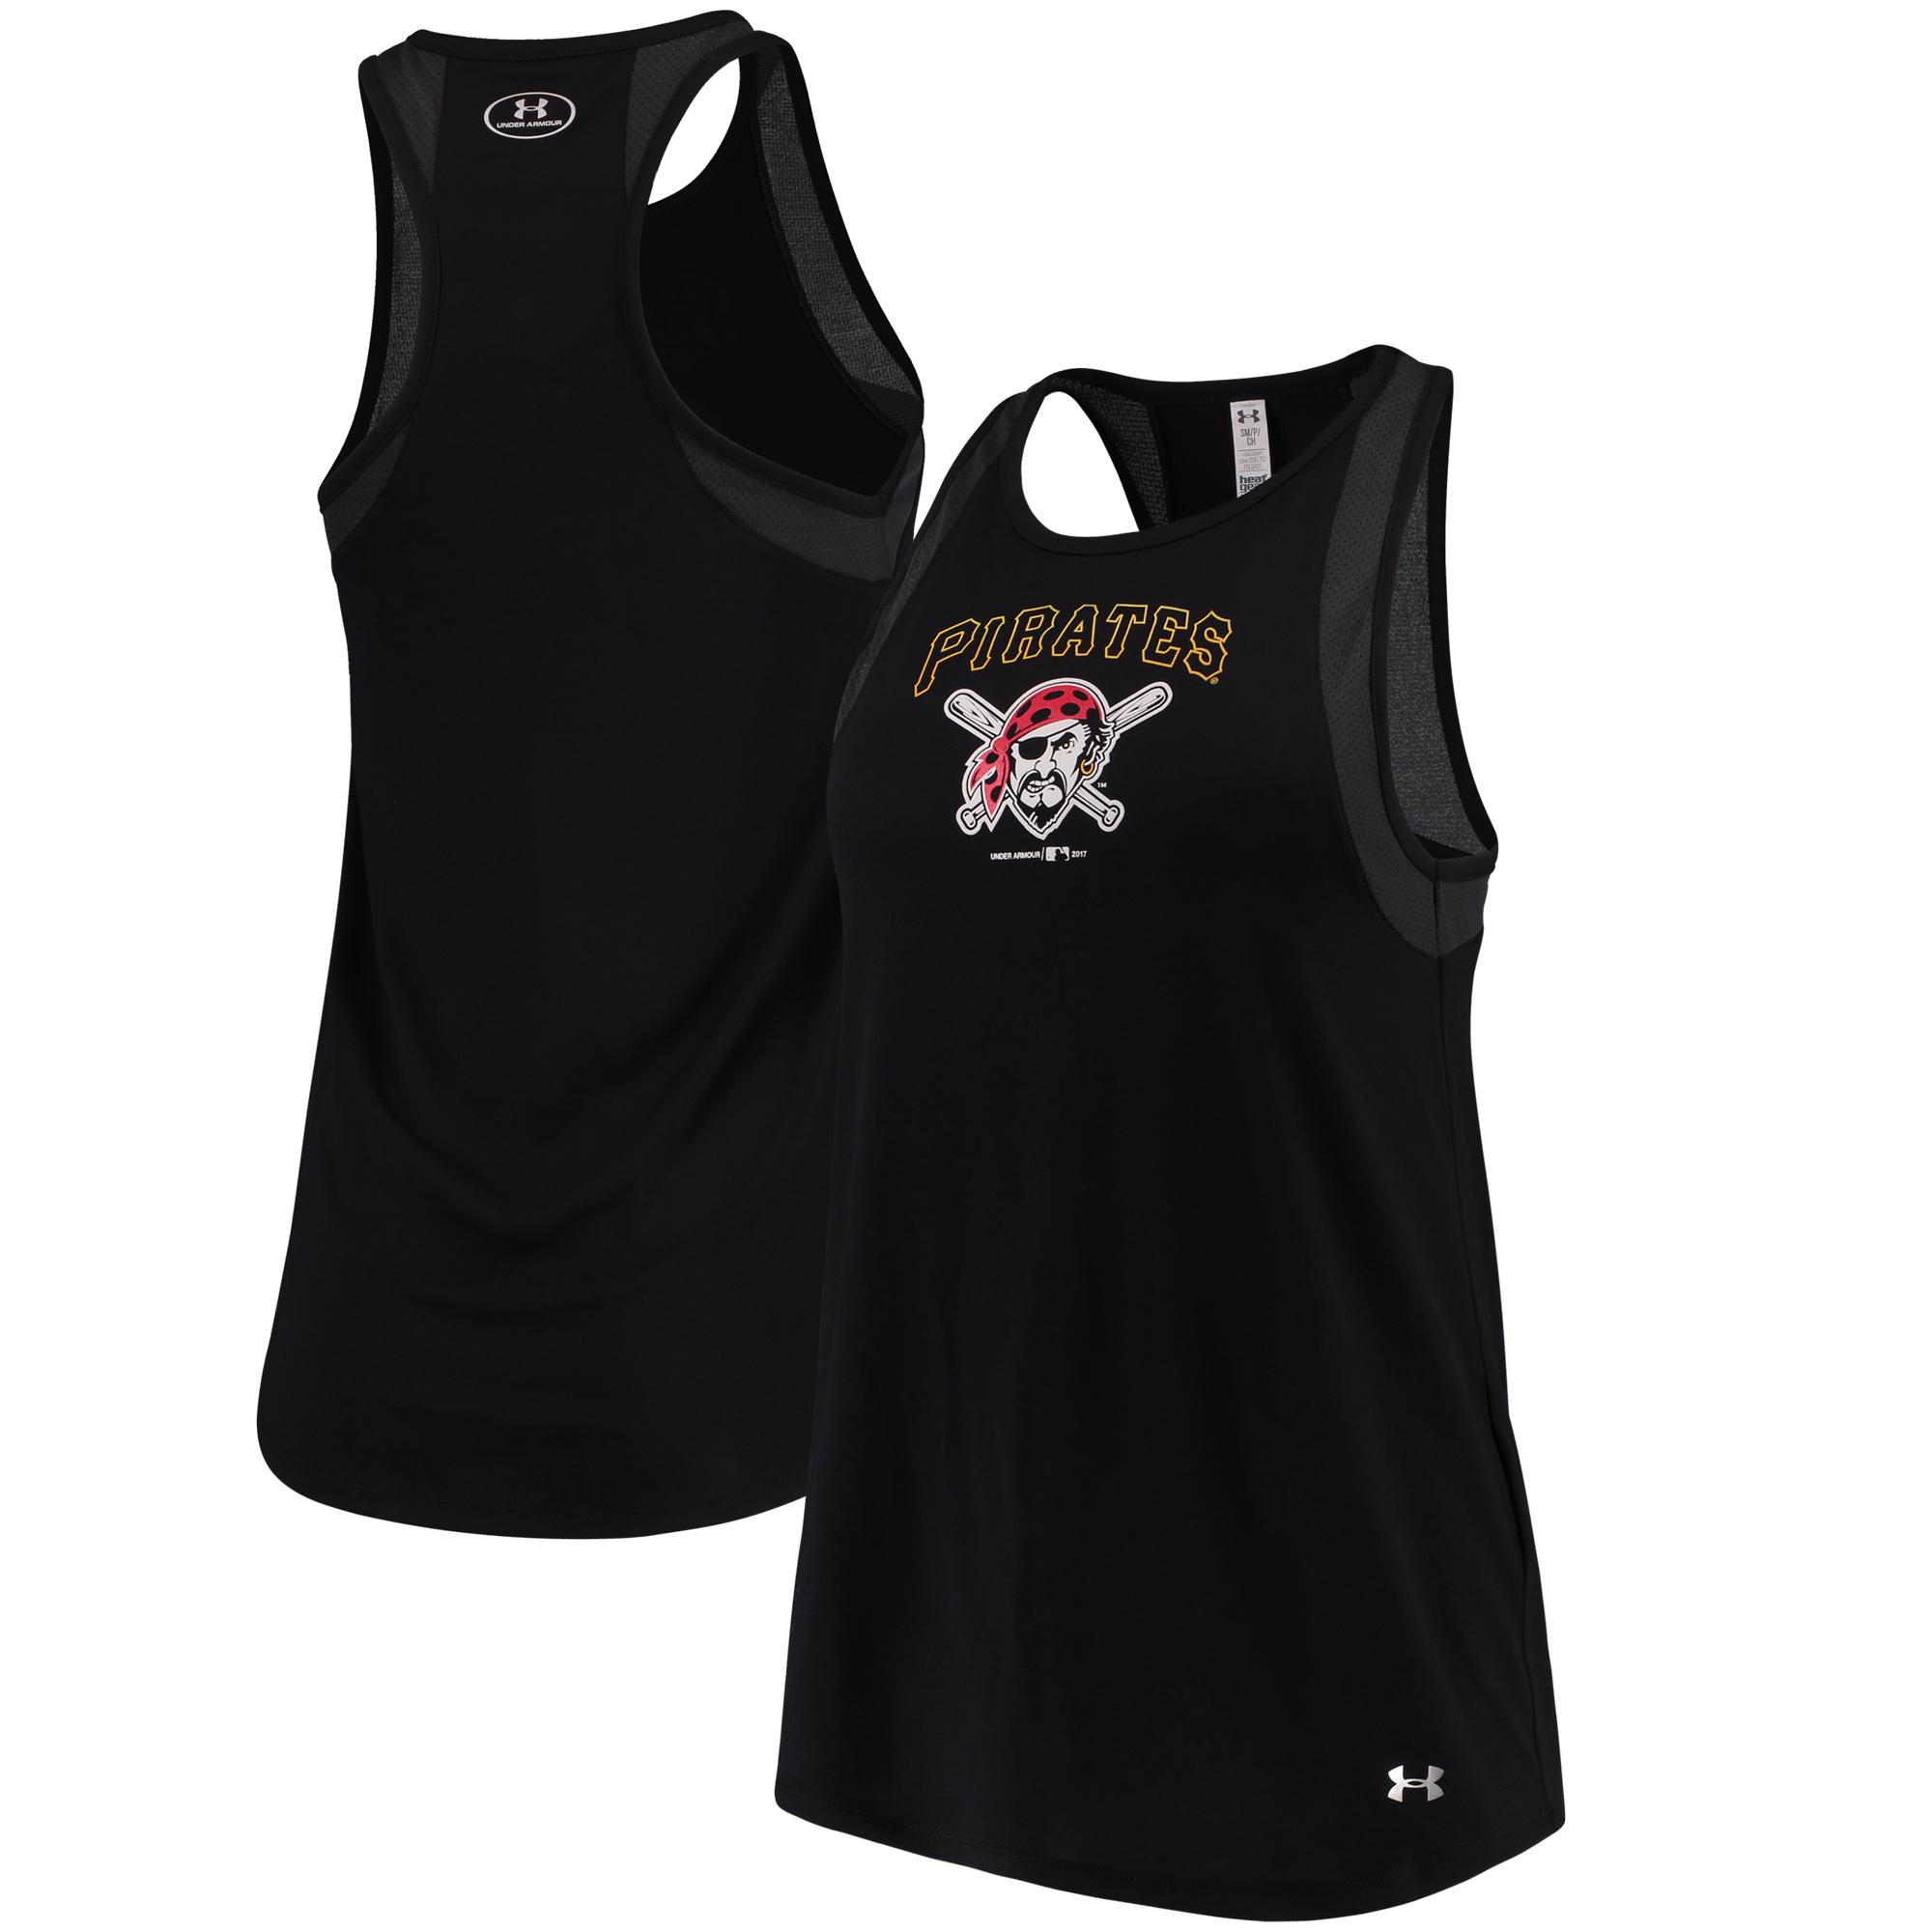 Pittsburgh Pirates Under Armour Women's Pointelle Mesh Performance Tank Top - Black